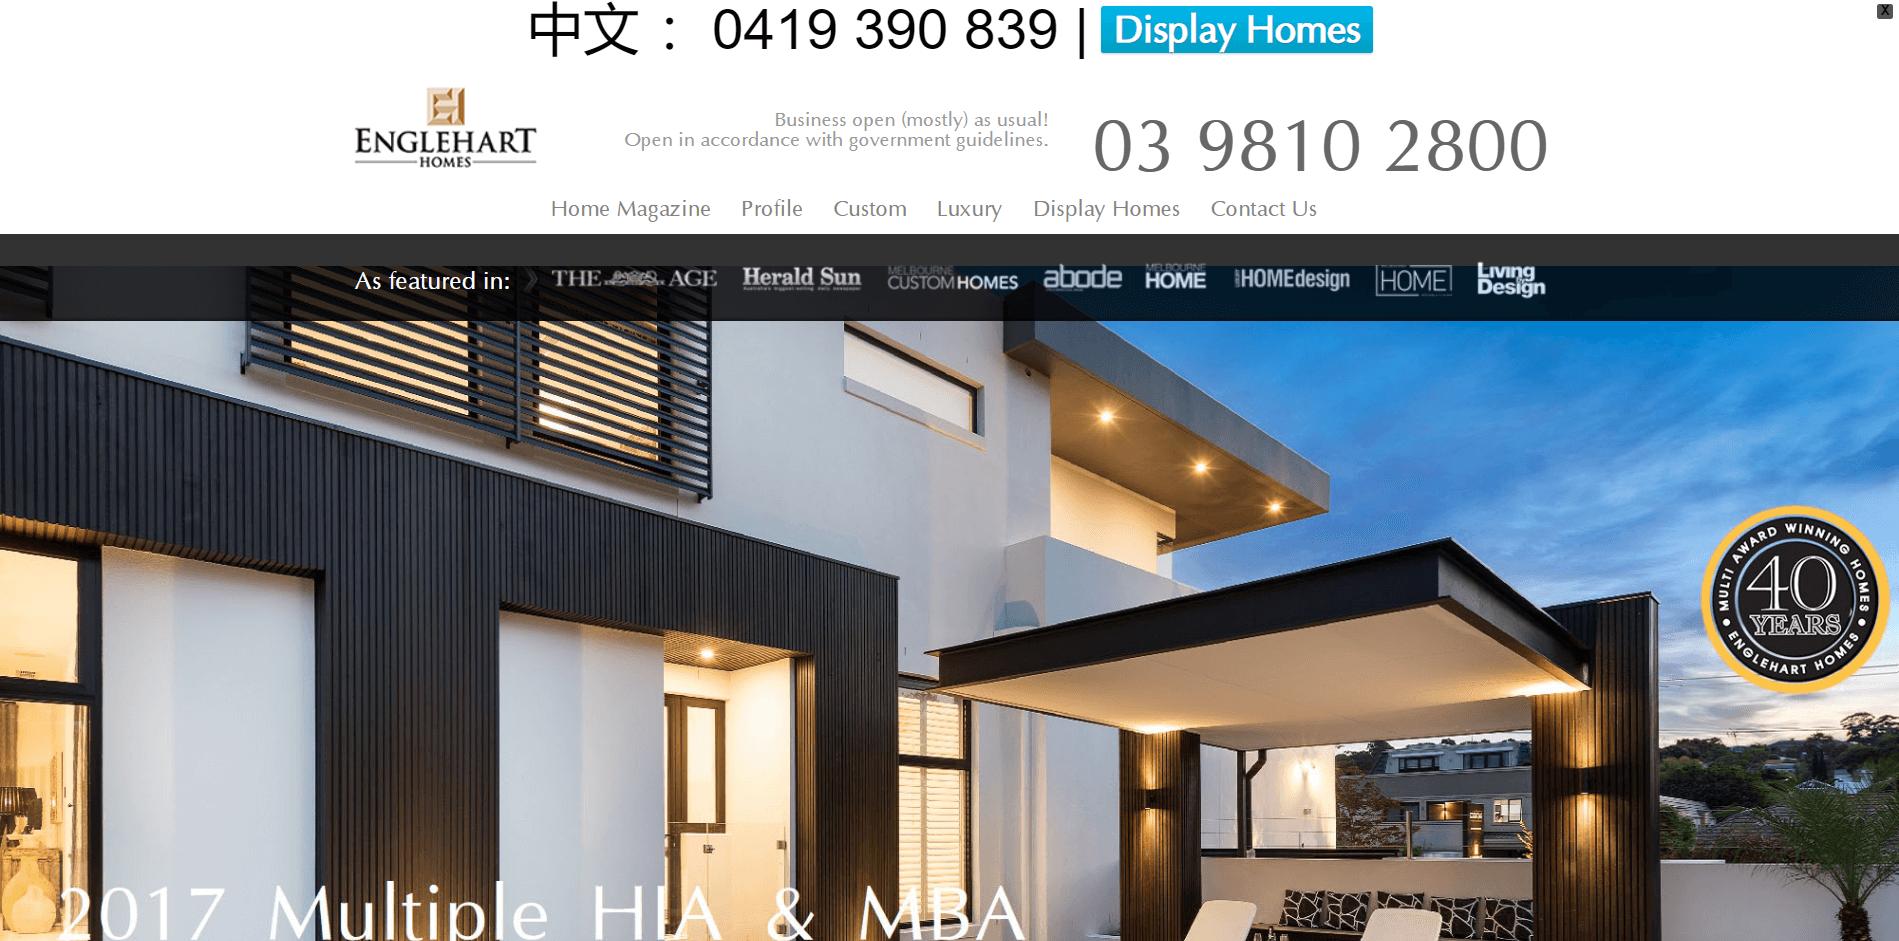 Englehart Homes